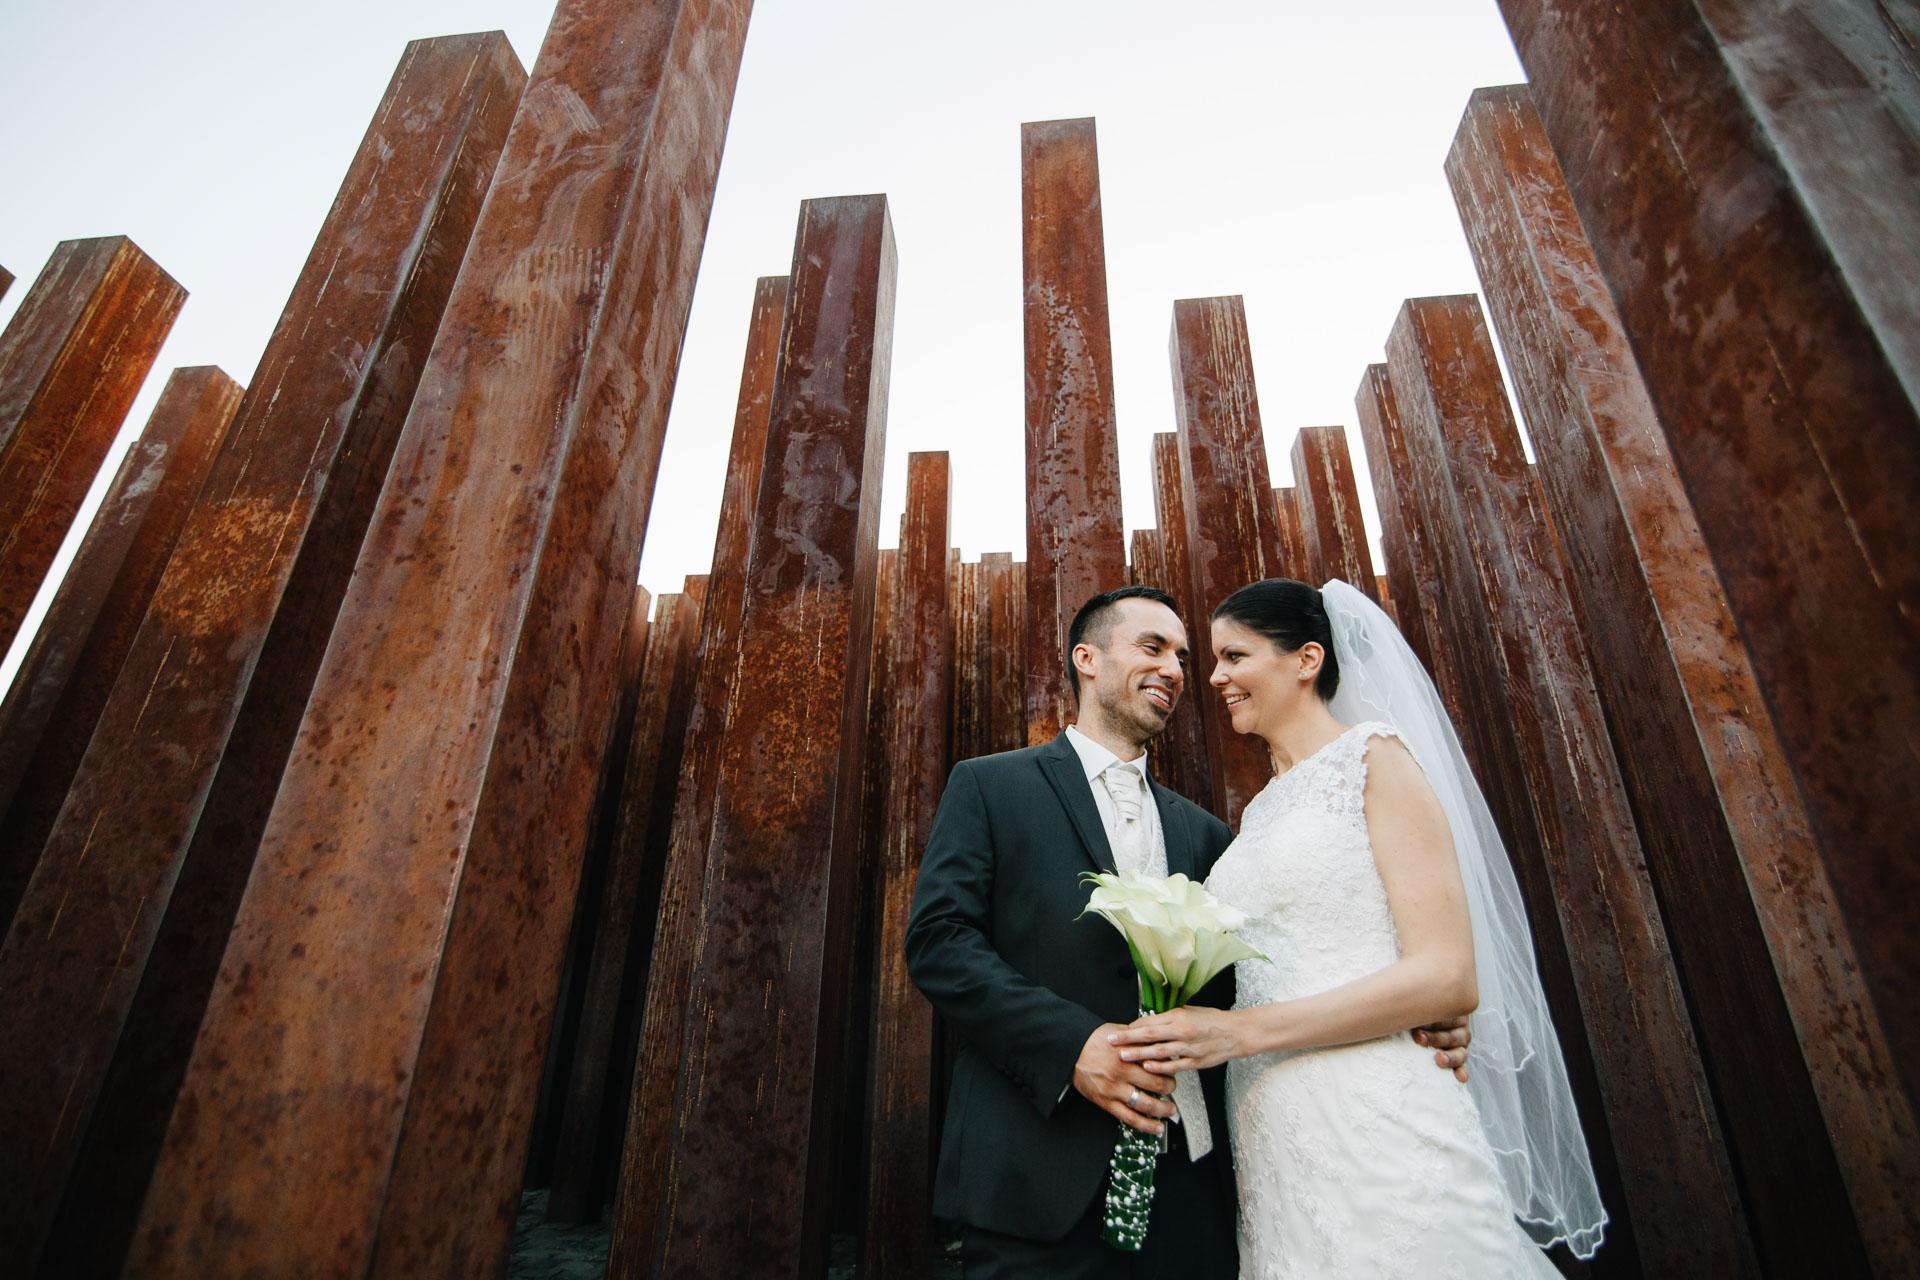 eskuvo_fotozas_wedding_foto_lenart_gabor_sztyui_budapest_IMG_6401